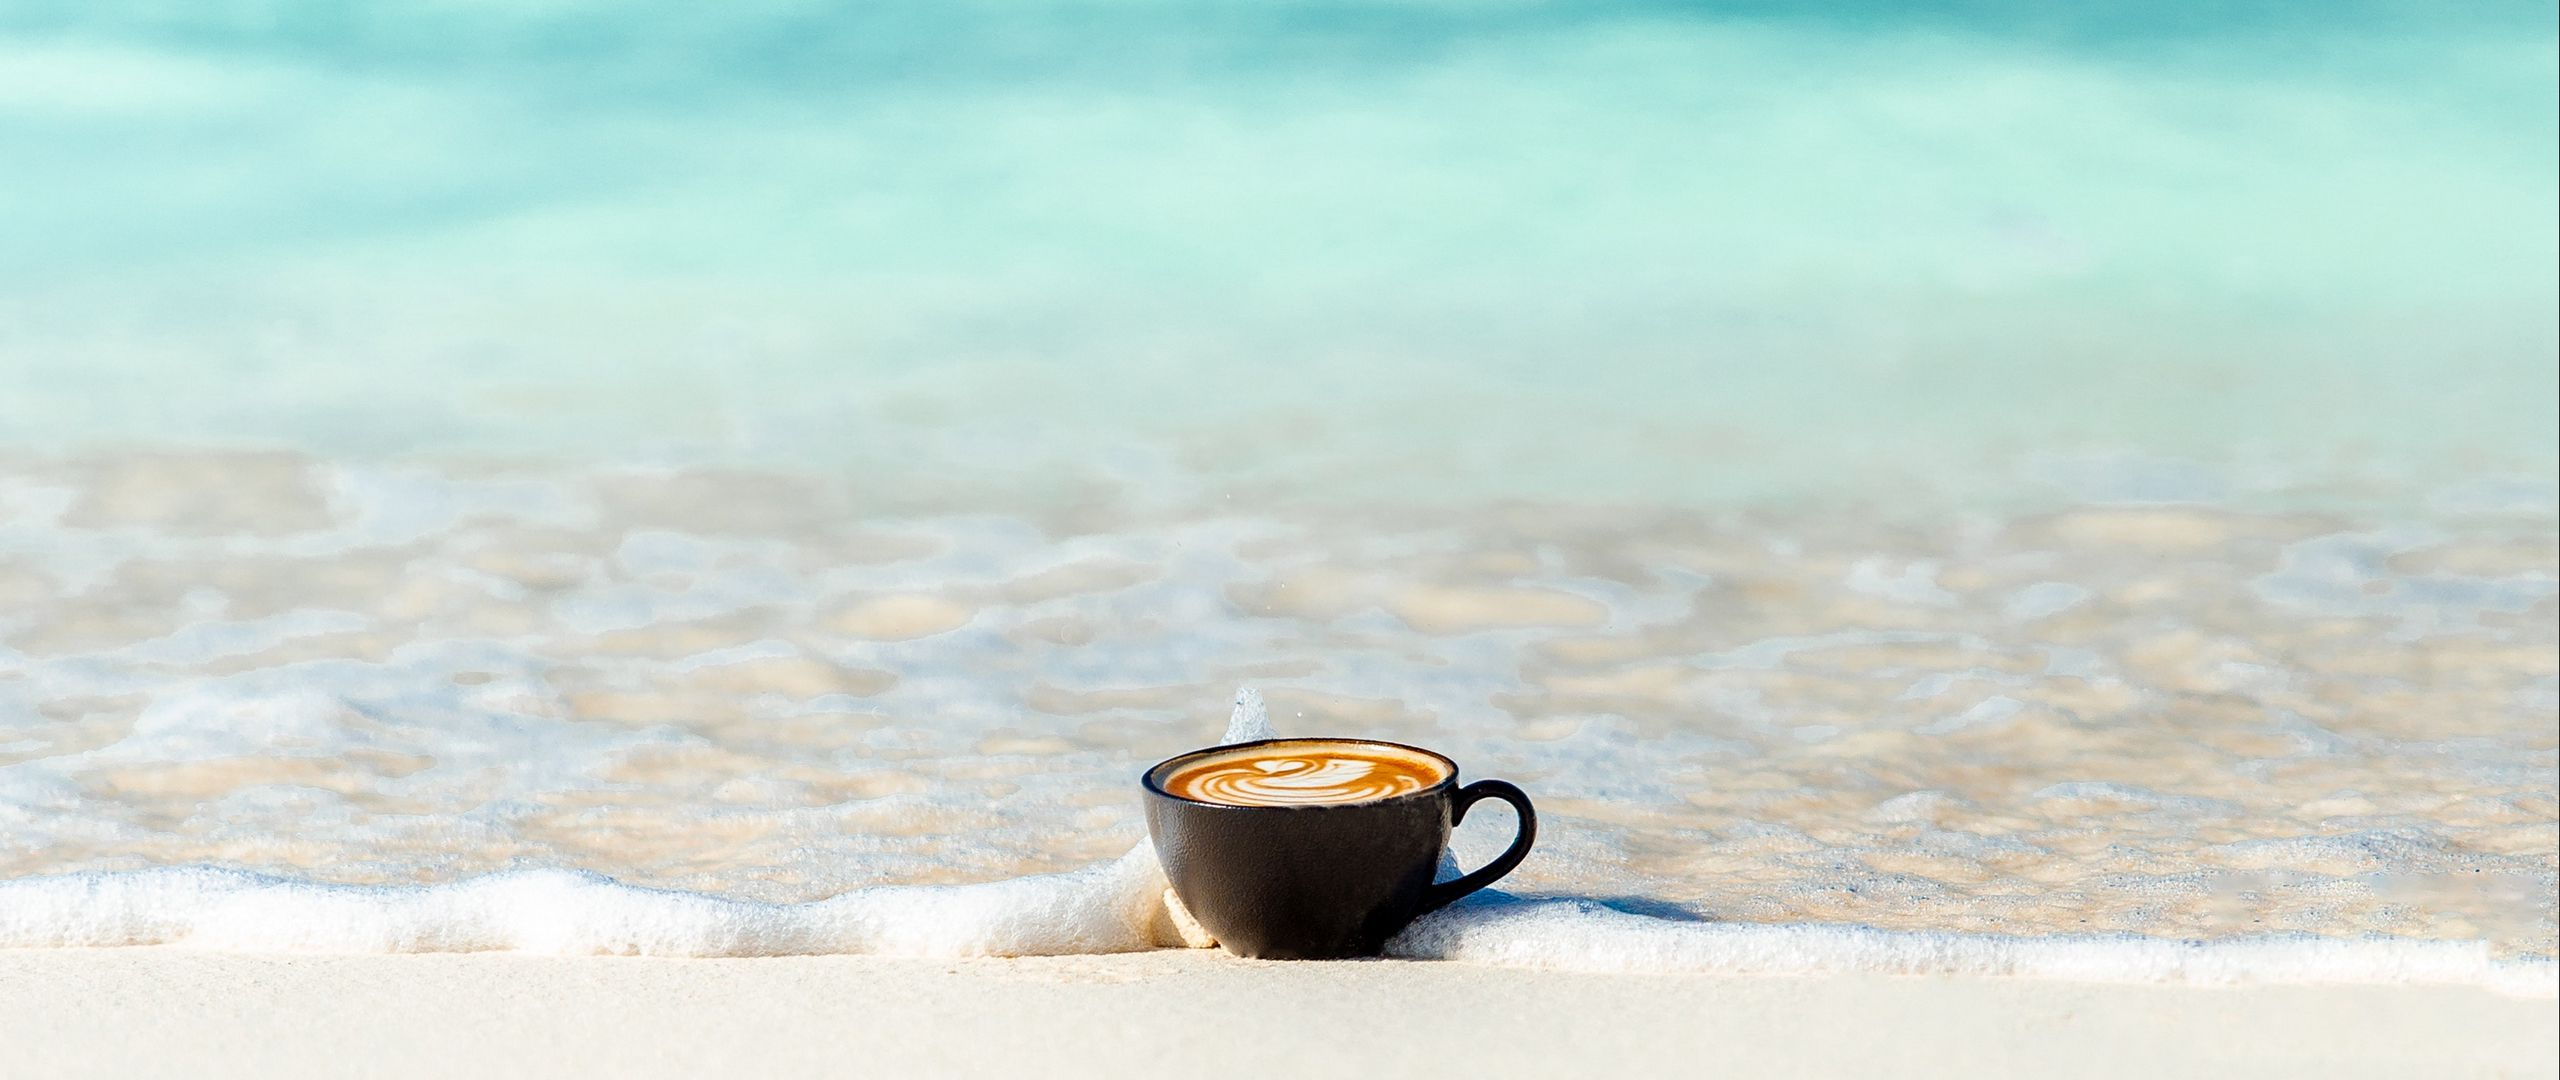 2560x1080 Wallpaper cup, ocean, sand, coast, minimalism